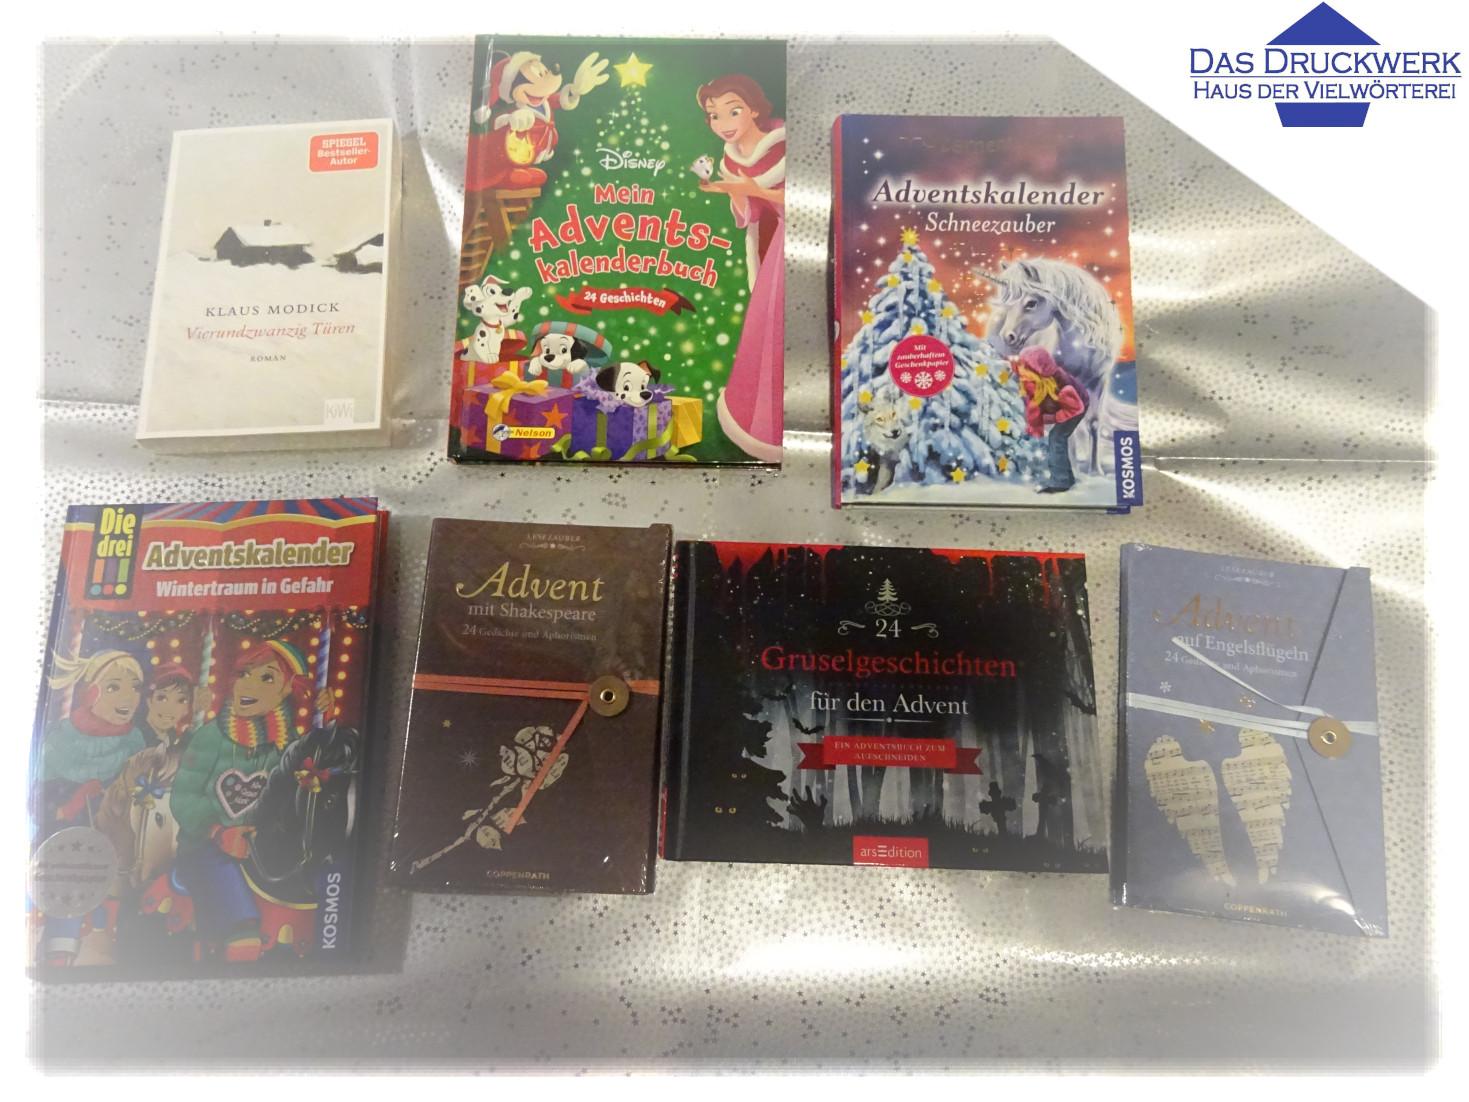 Adventsbücher